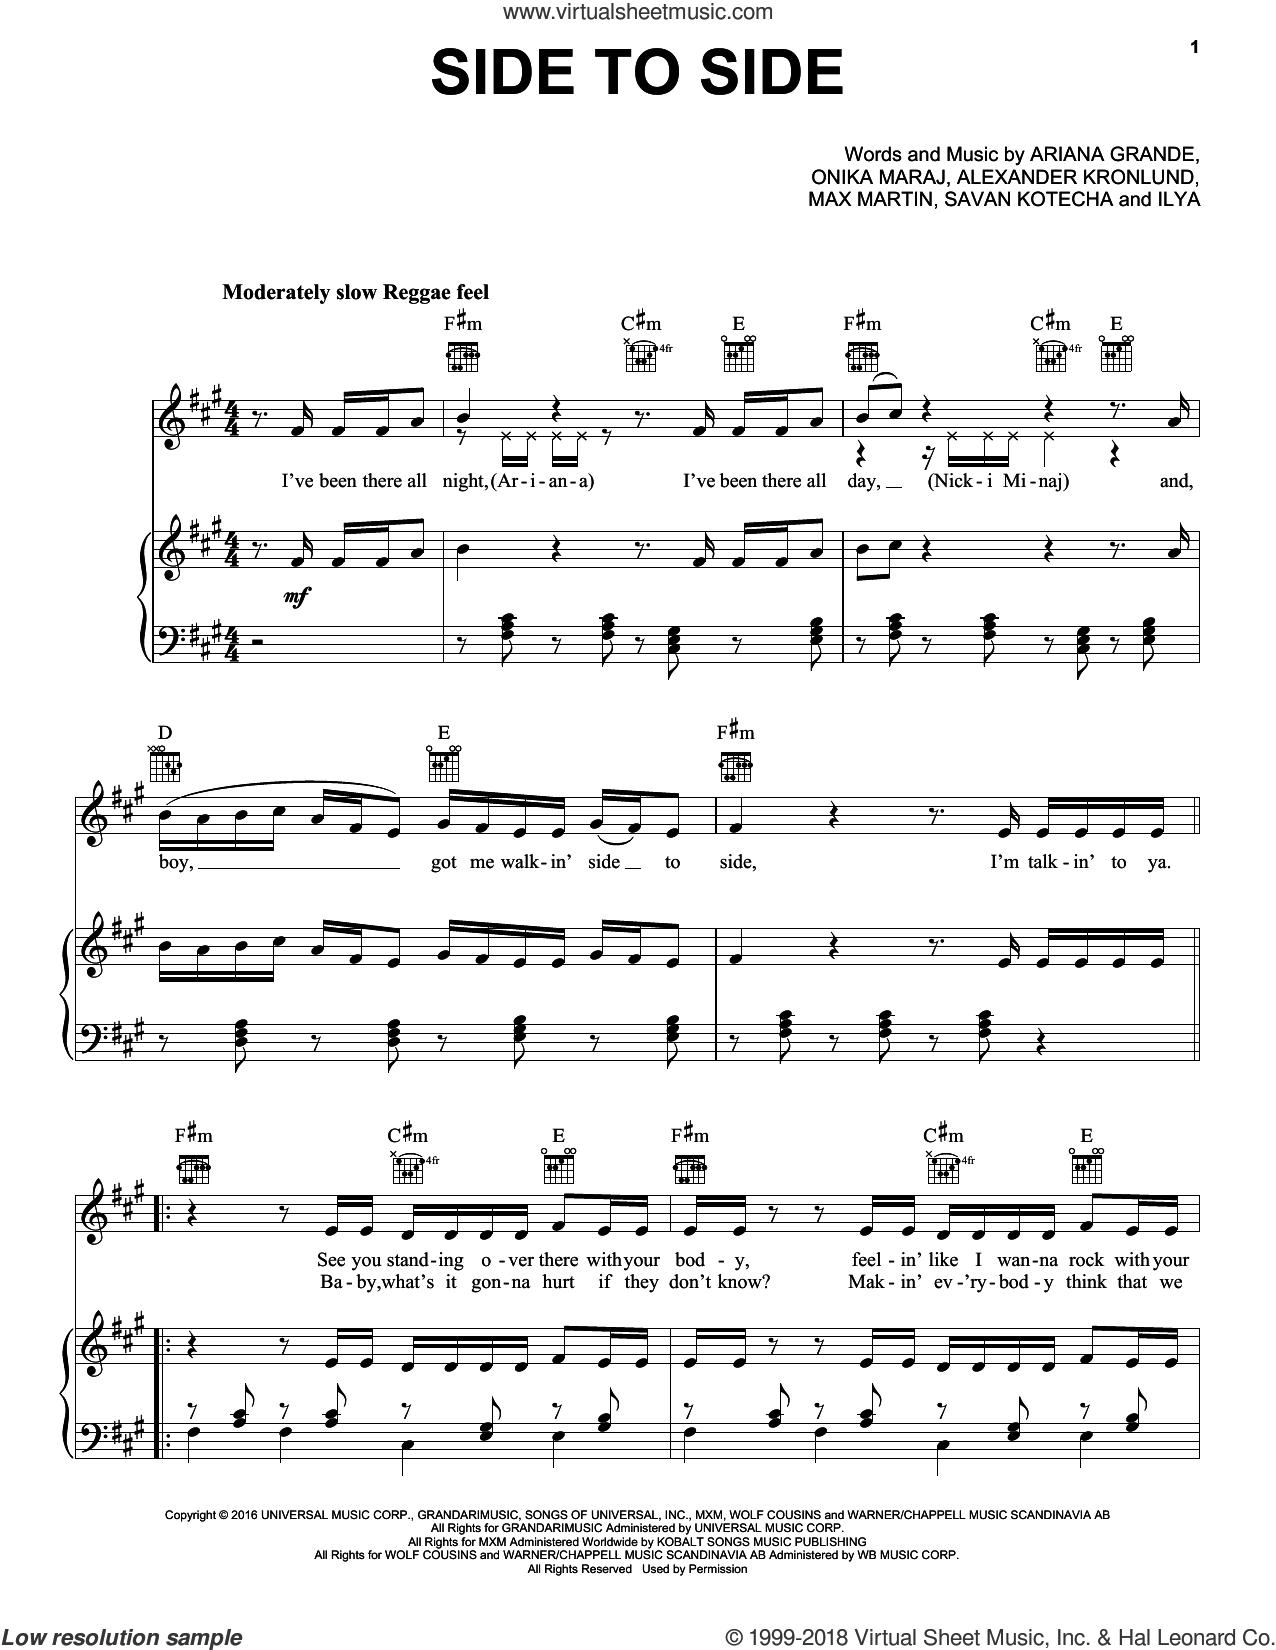 Side To Side sheet music for voice, piano or guitar by Ariana Grande feat. Nicki Minaj, Alexander Kronlund, Ilya Salmanzadeh, Max Martin, Onika Maraj and Savan Kotecha, intermediate skill level